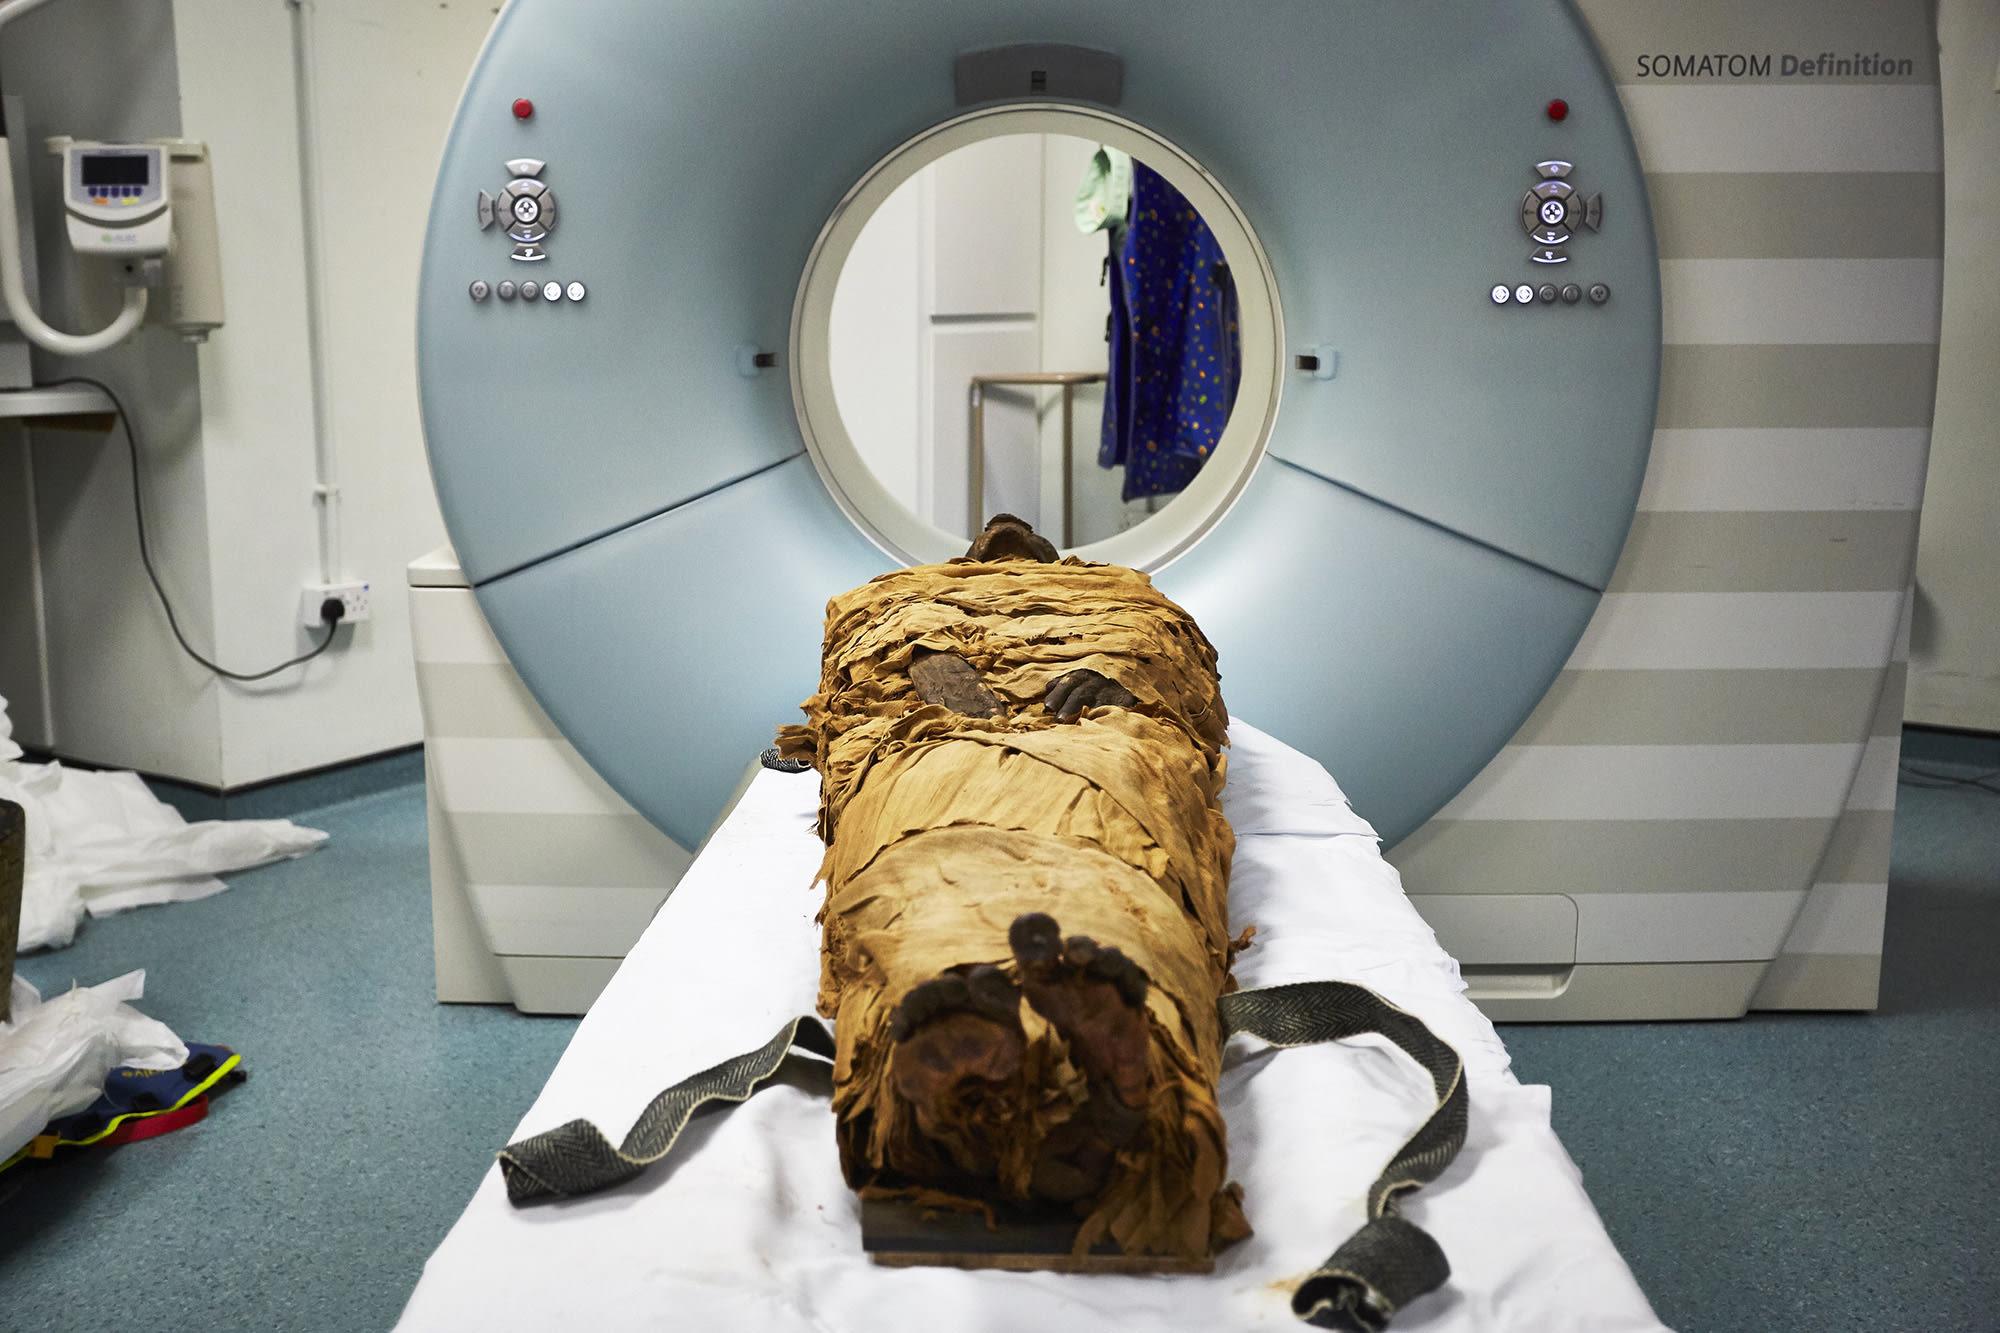 Nesyamun's mummified body on a CT scanner in the UK